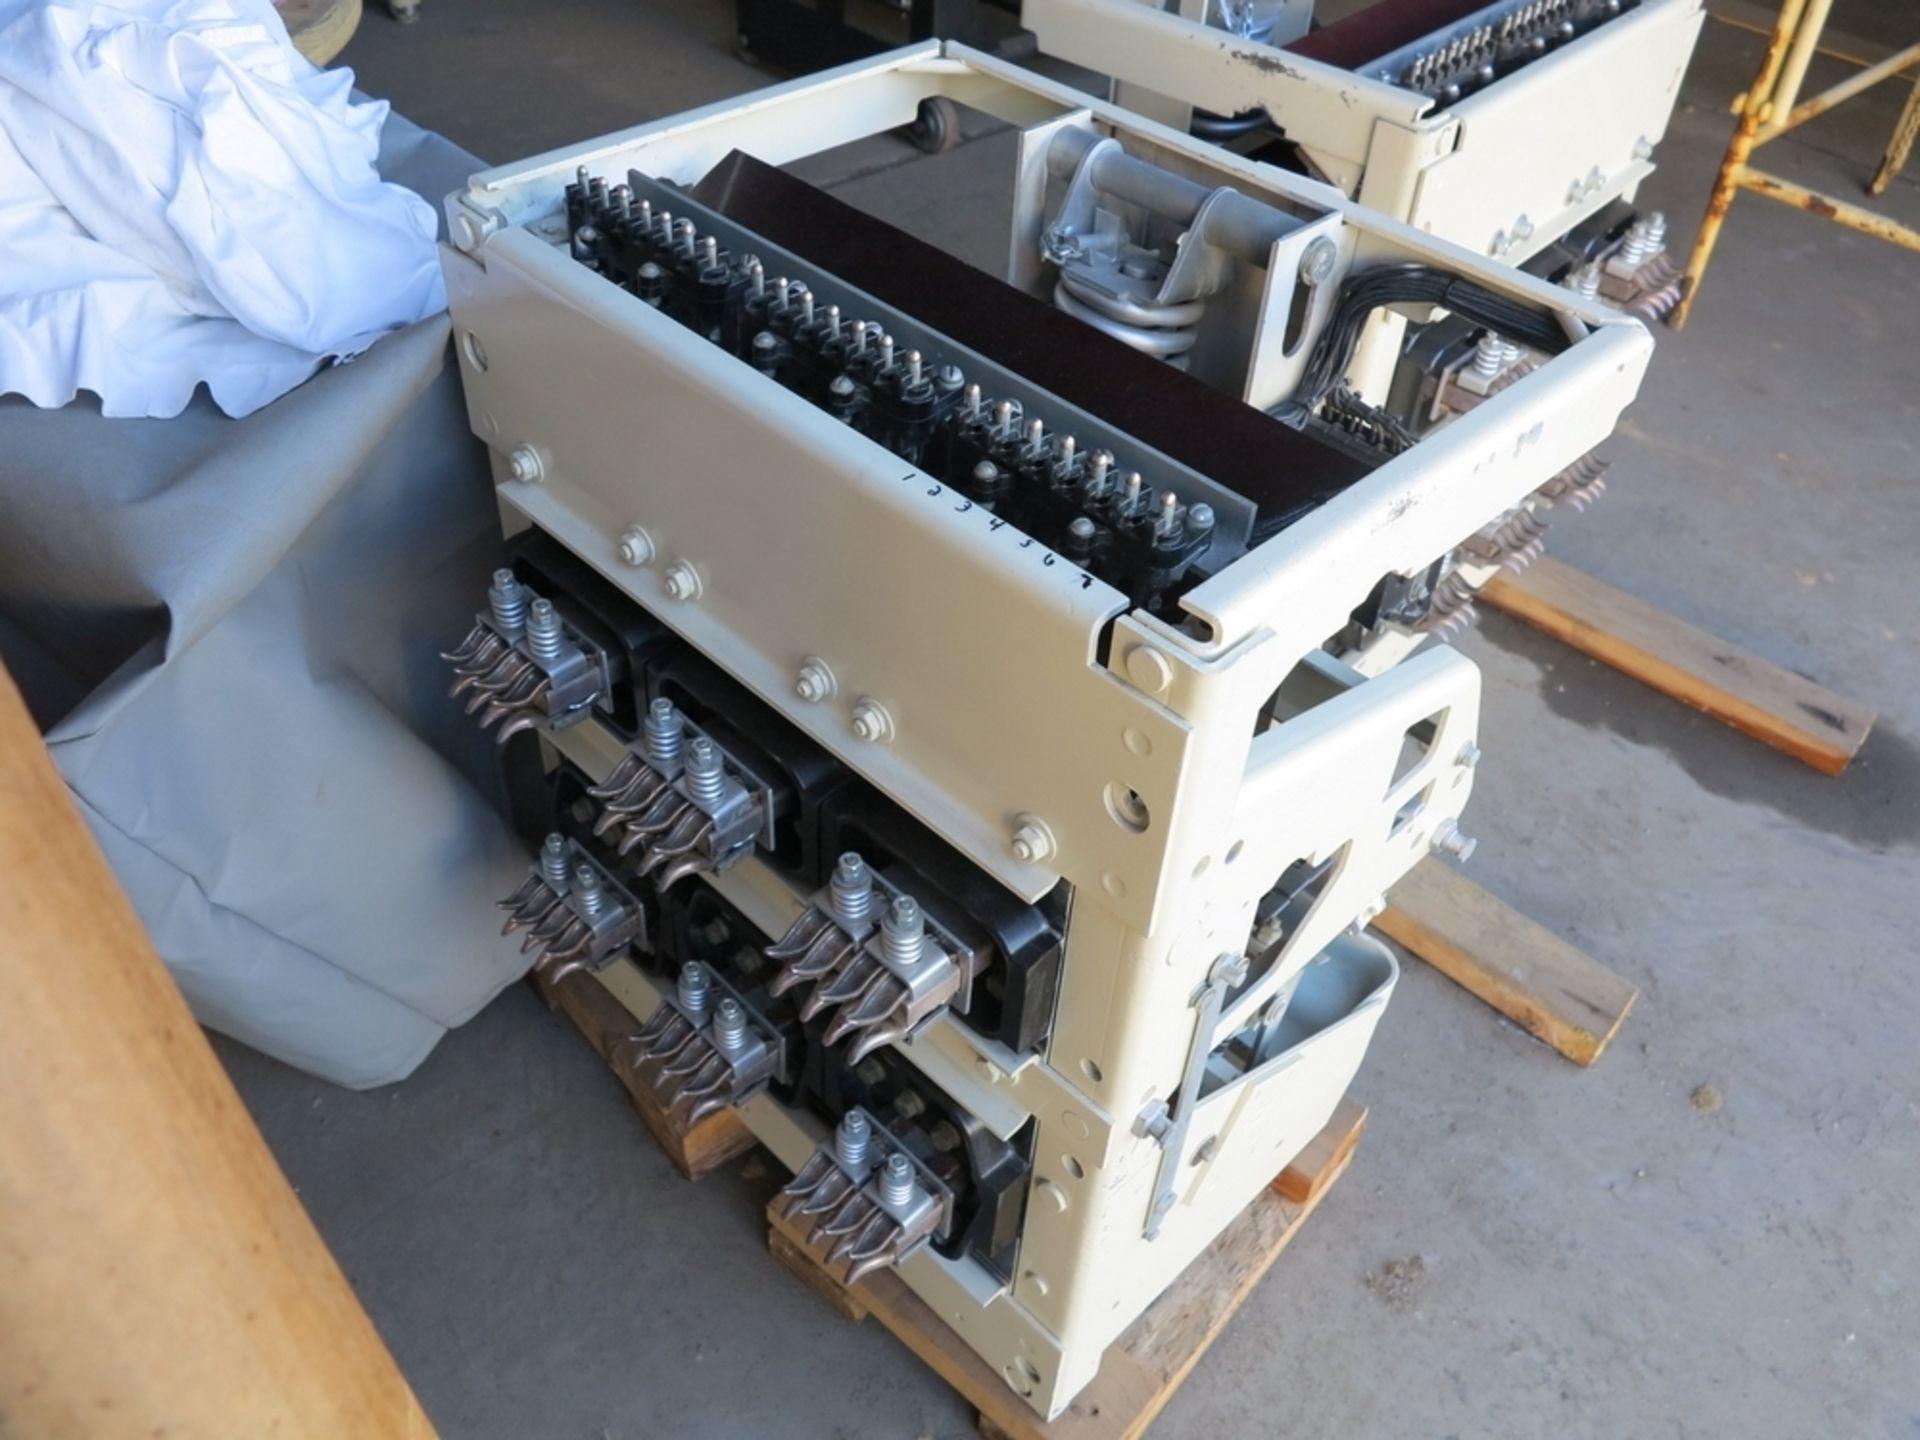 Lot 457 - GE LOW VOLTAGE CIRCUIT BREAKER, 1600 AMP, NO. 156A5920-200